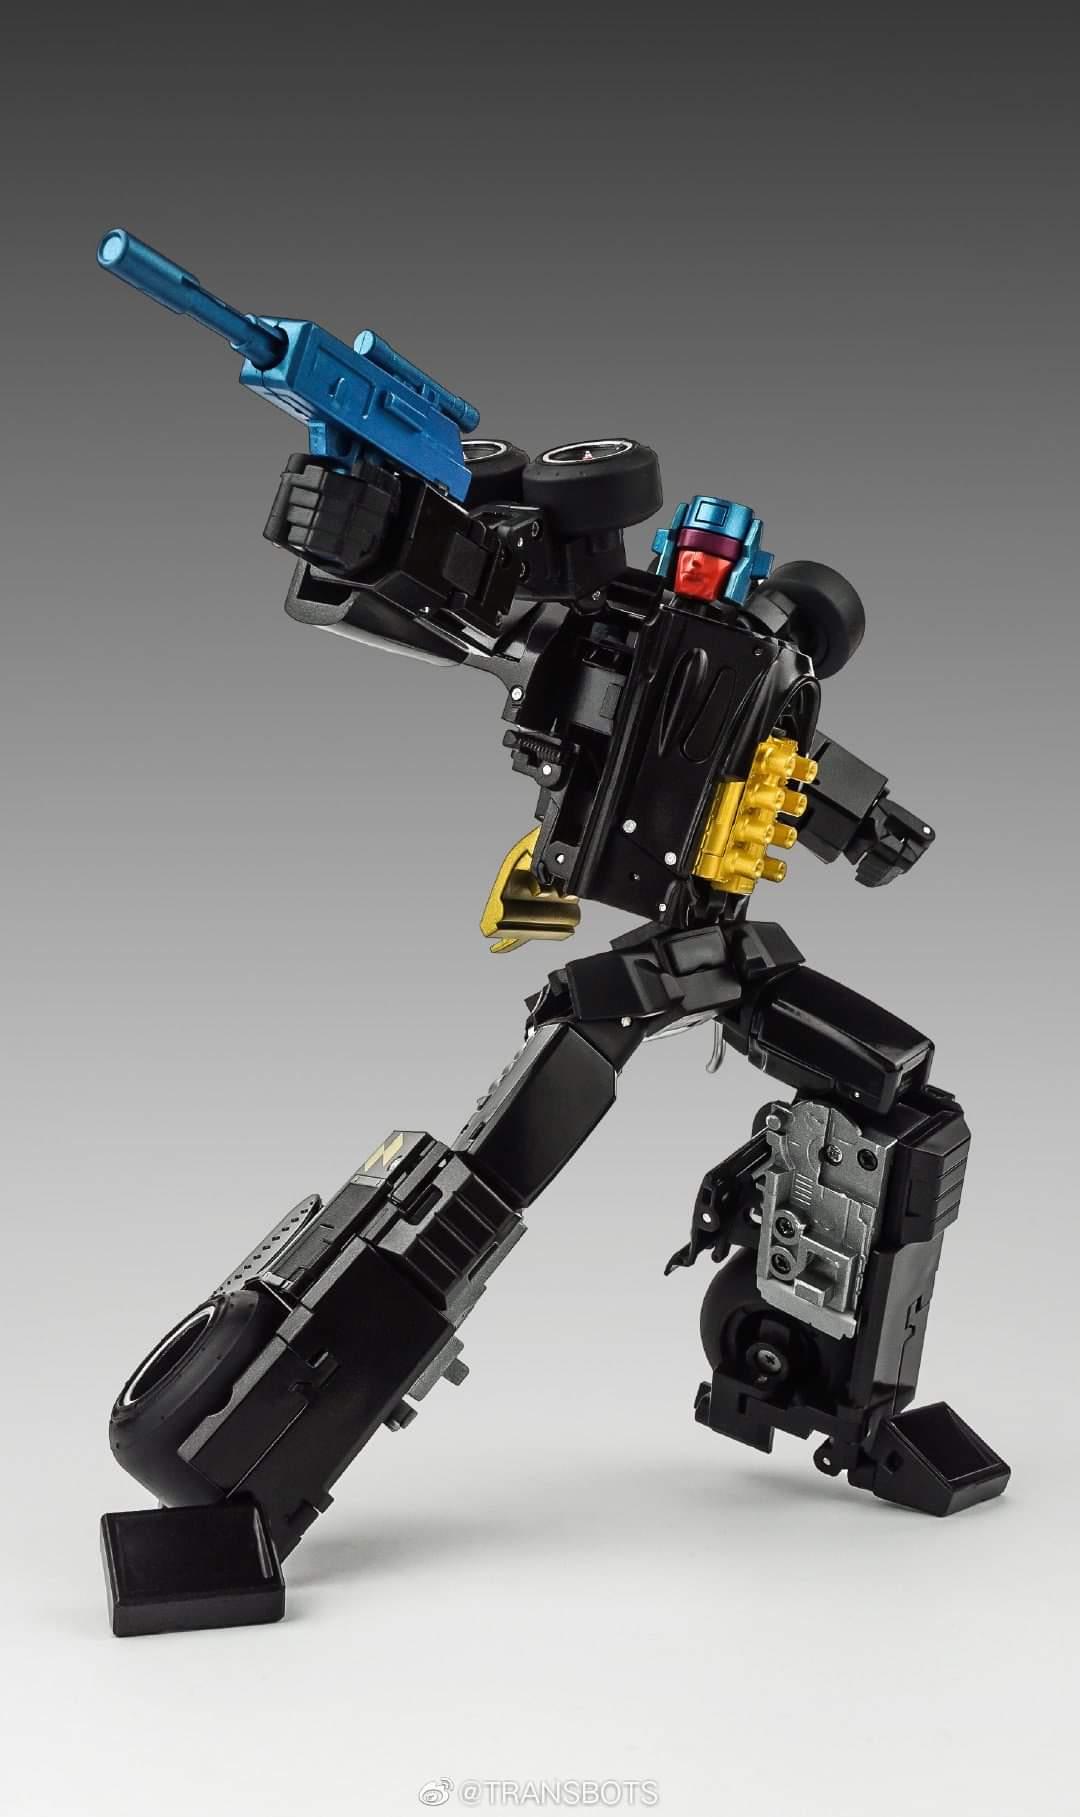 [X-Transbots] Produit Tiers - Jouets Berserkars forme Monolith (MX-XIII à MX-VII) - aka Stunticons forme Menasor/Menaseur - Page 6 ZwXmm92V_o